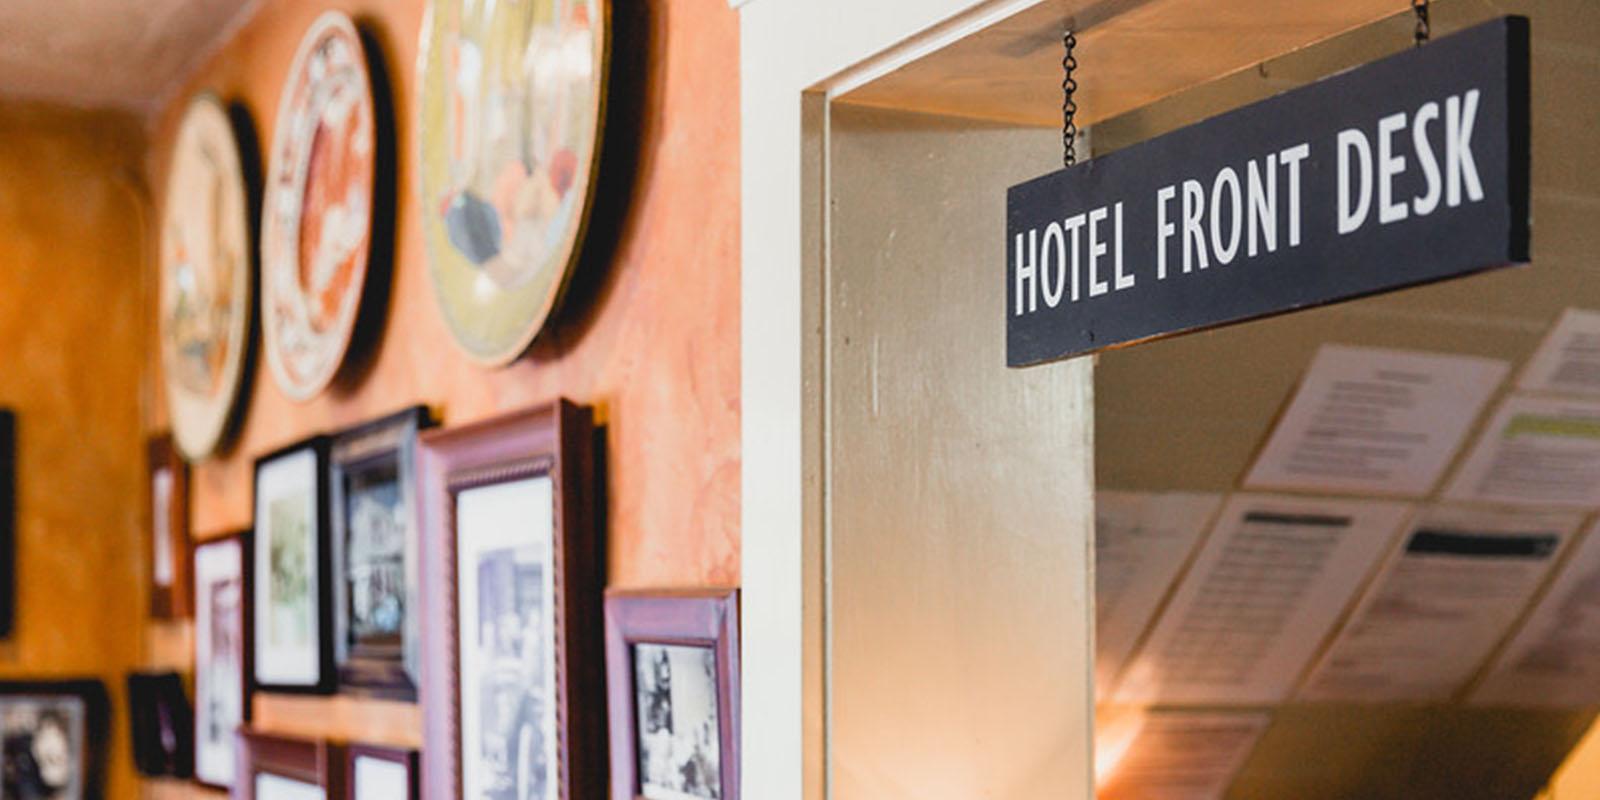 A TRUE BOUTIQUE HOTEL EXPERIENCE IN THE HEART OF SAN RAFAEL, CALIFORNIA